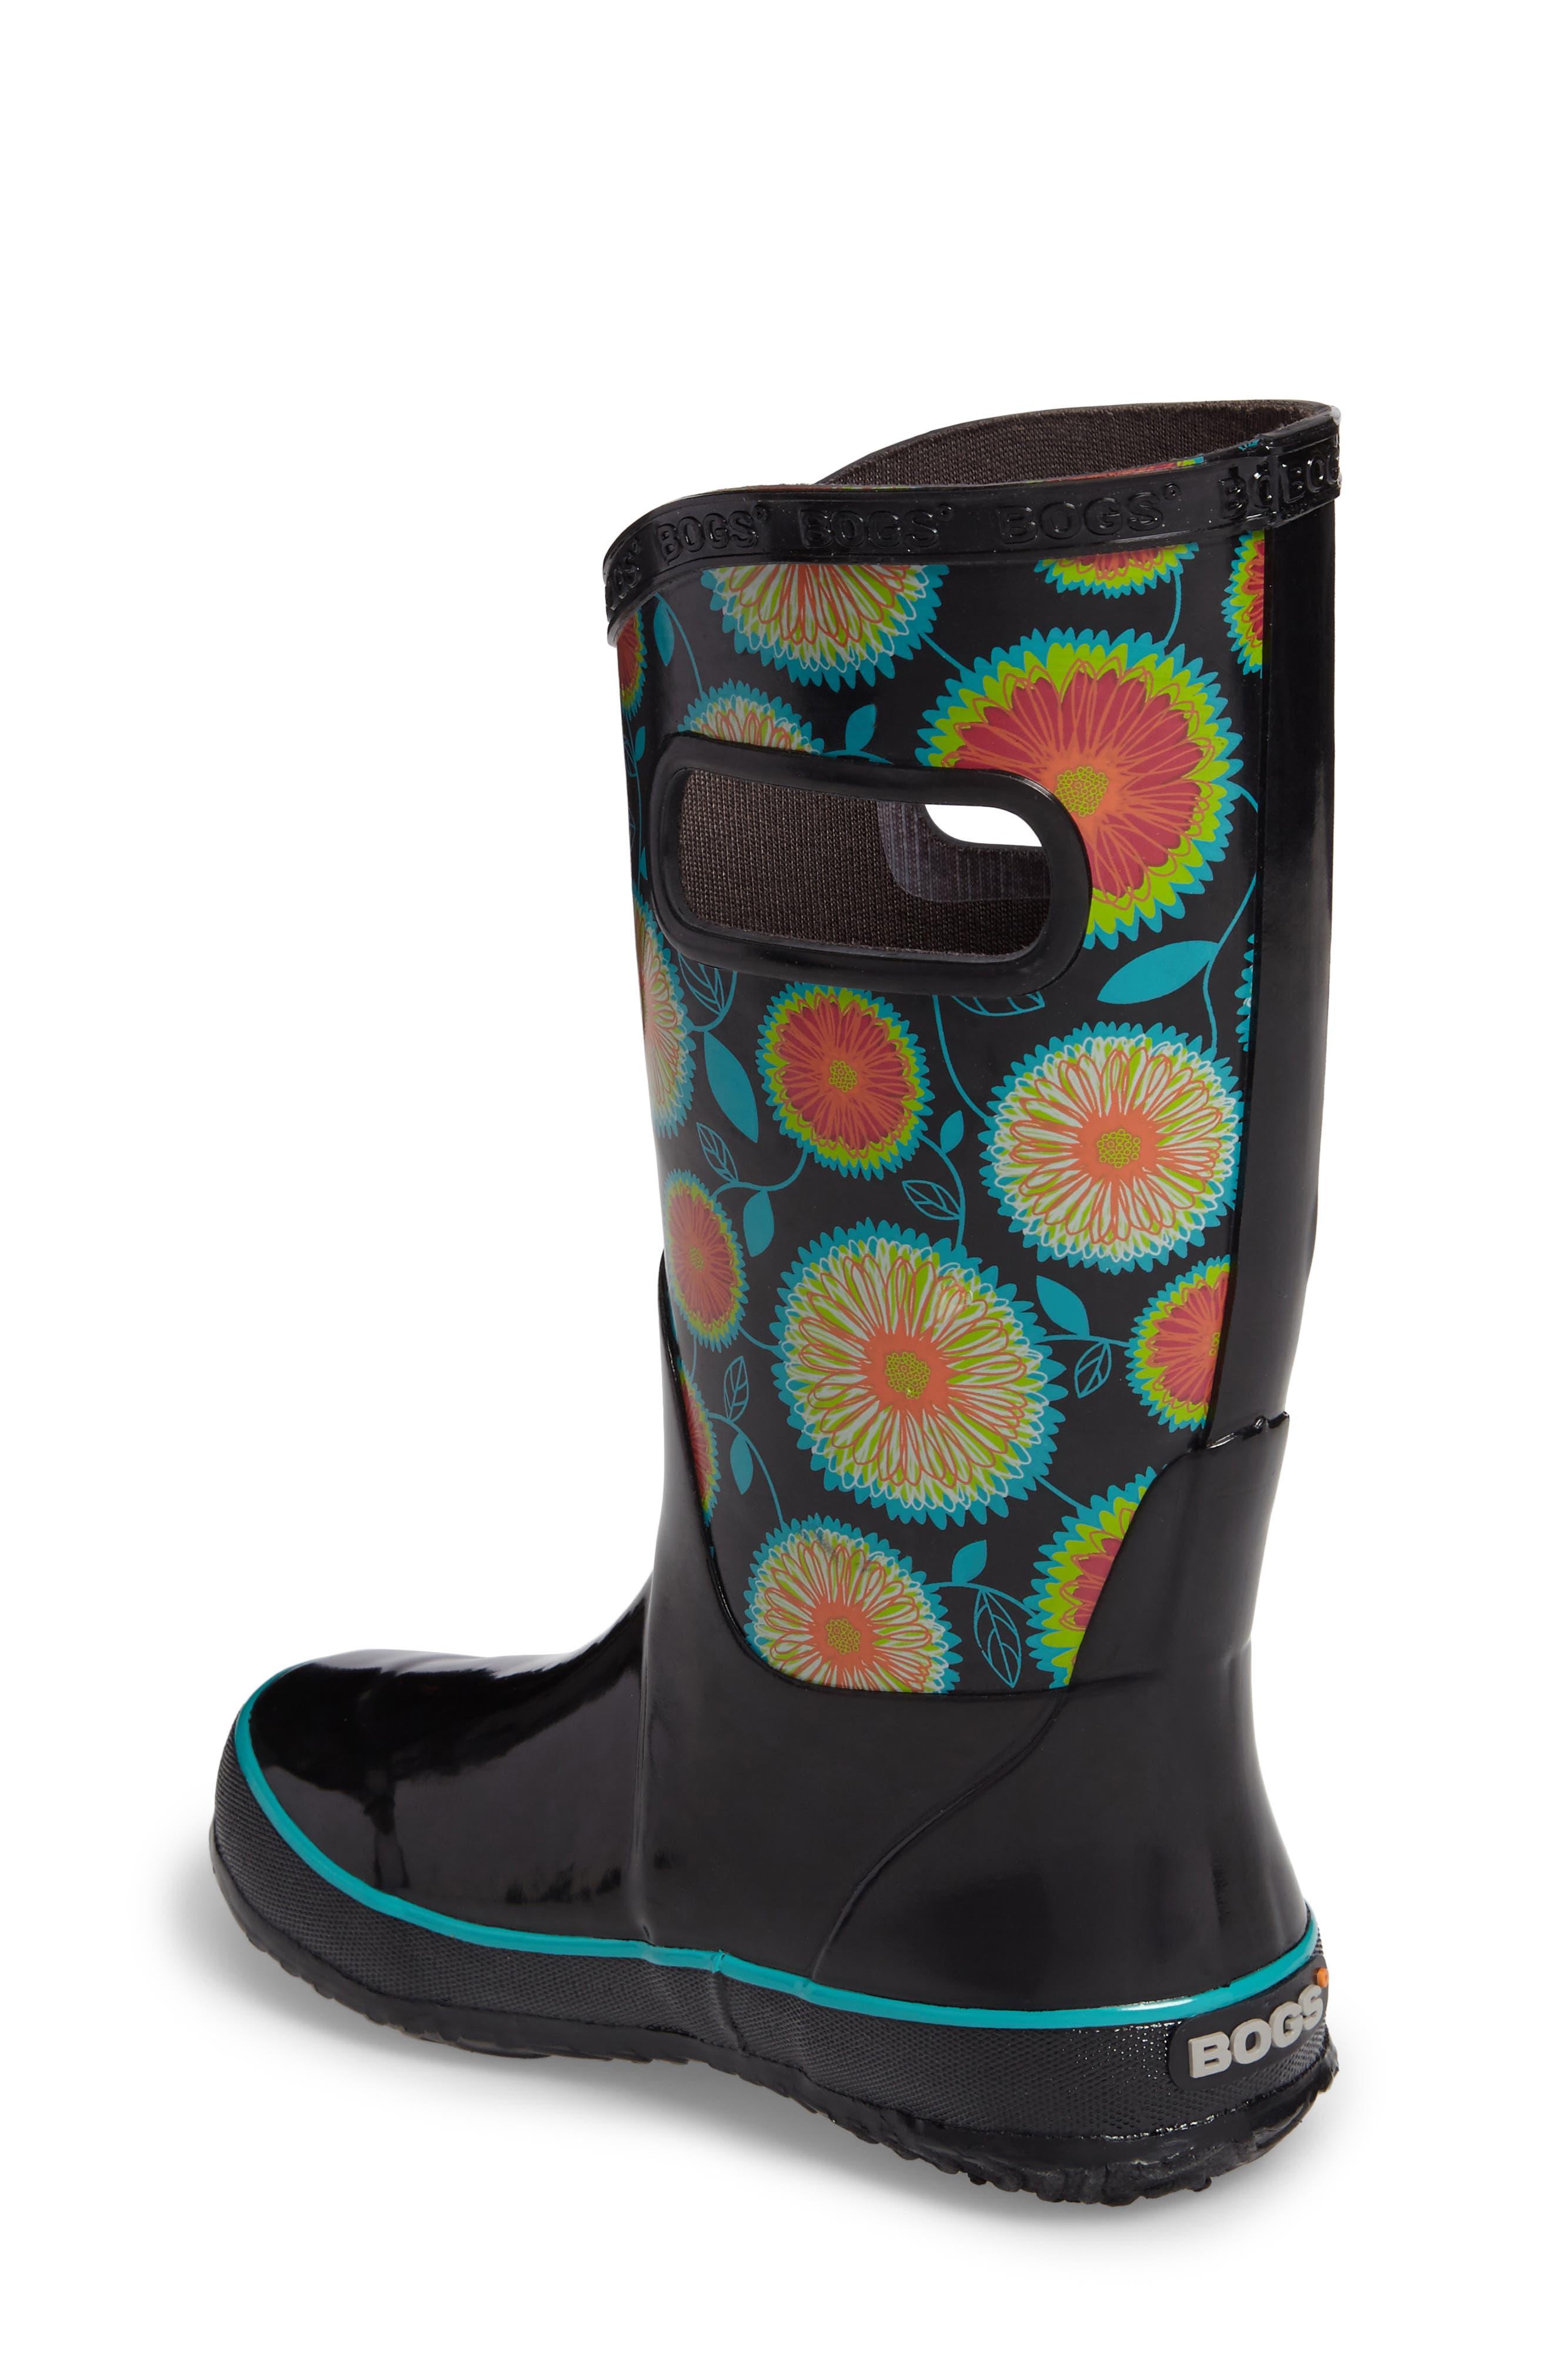 Wildflowers Waterproof Rubber Rain Boot,                             Alternate thumbnail 2, color,                             Black Multi